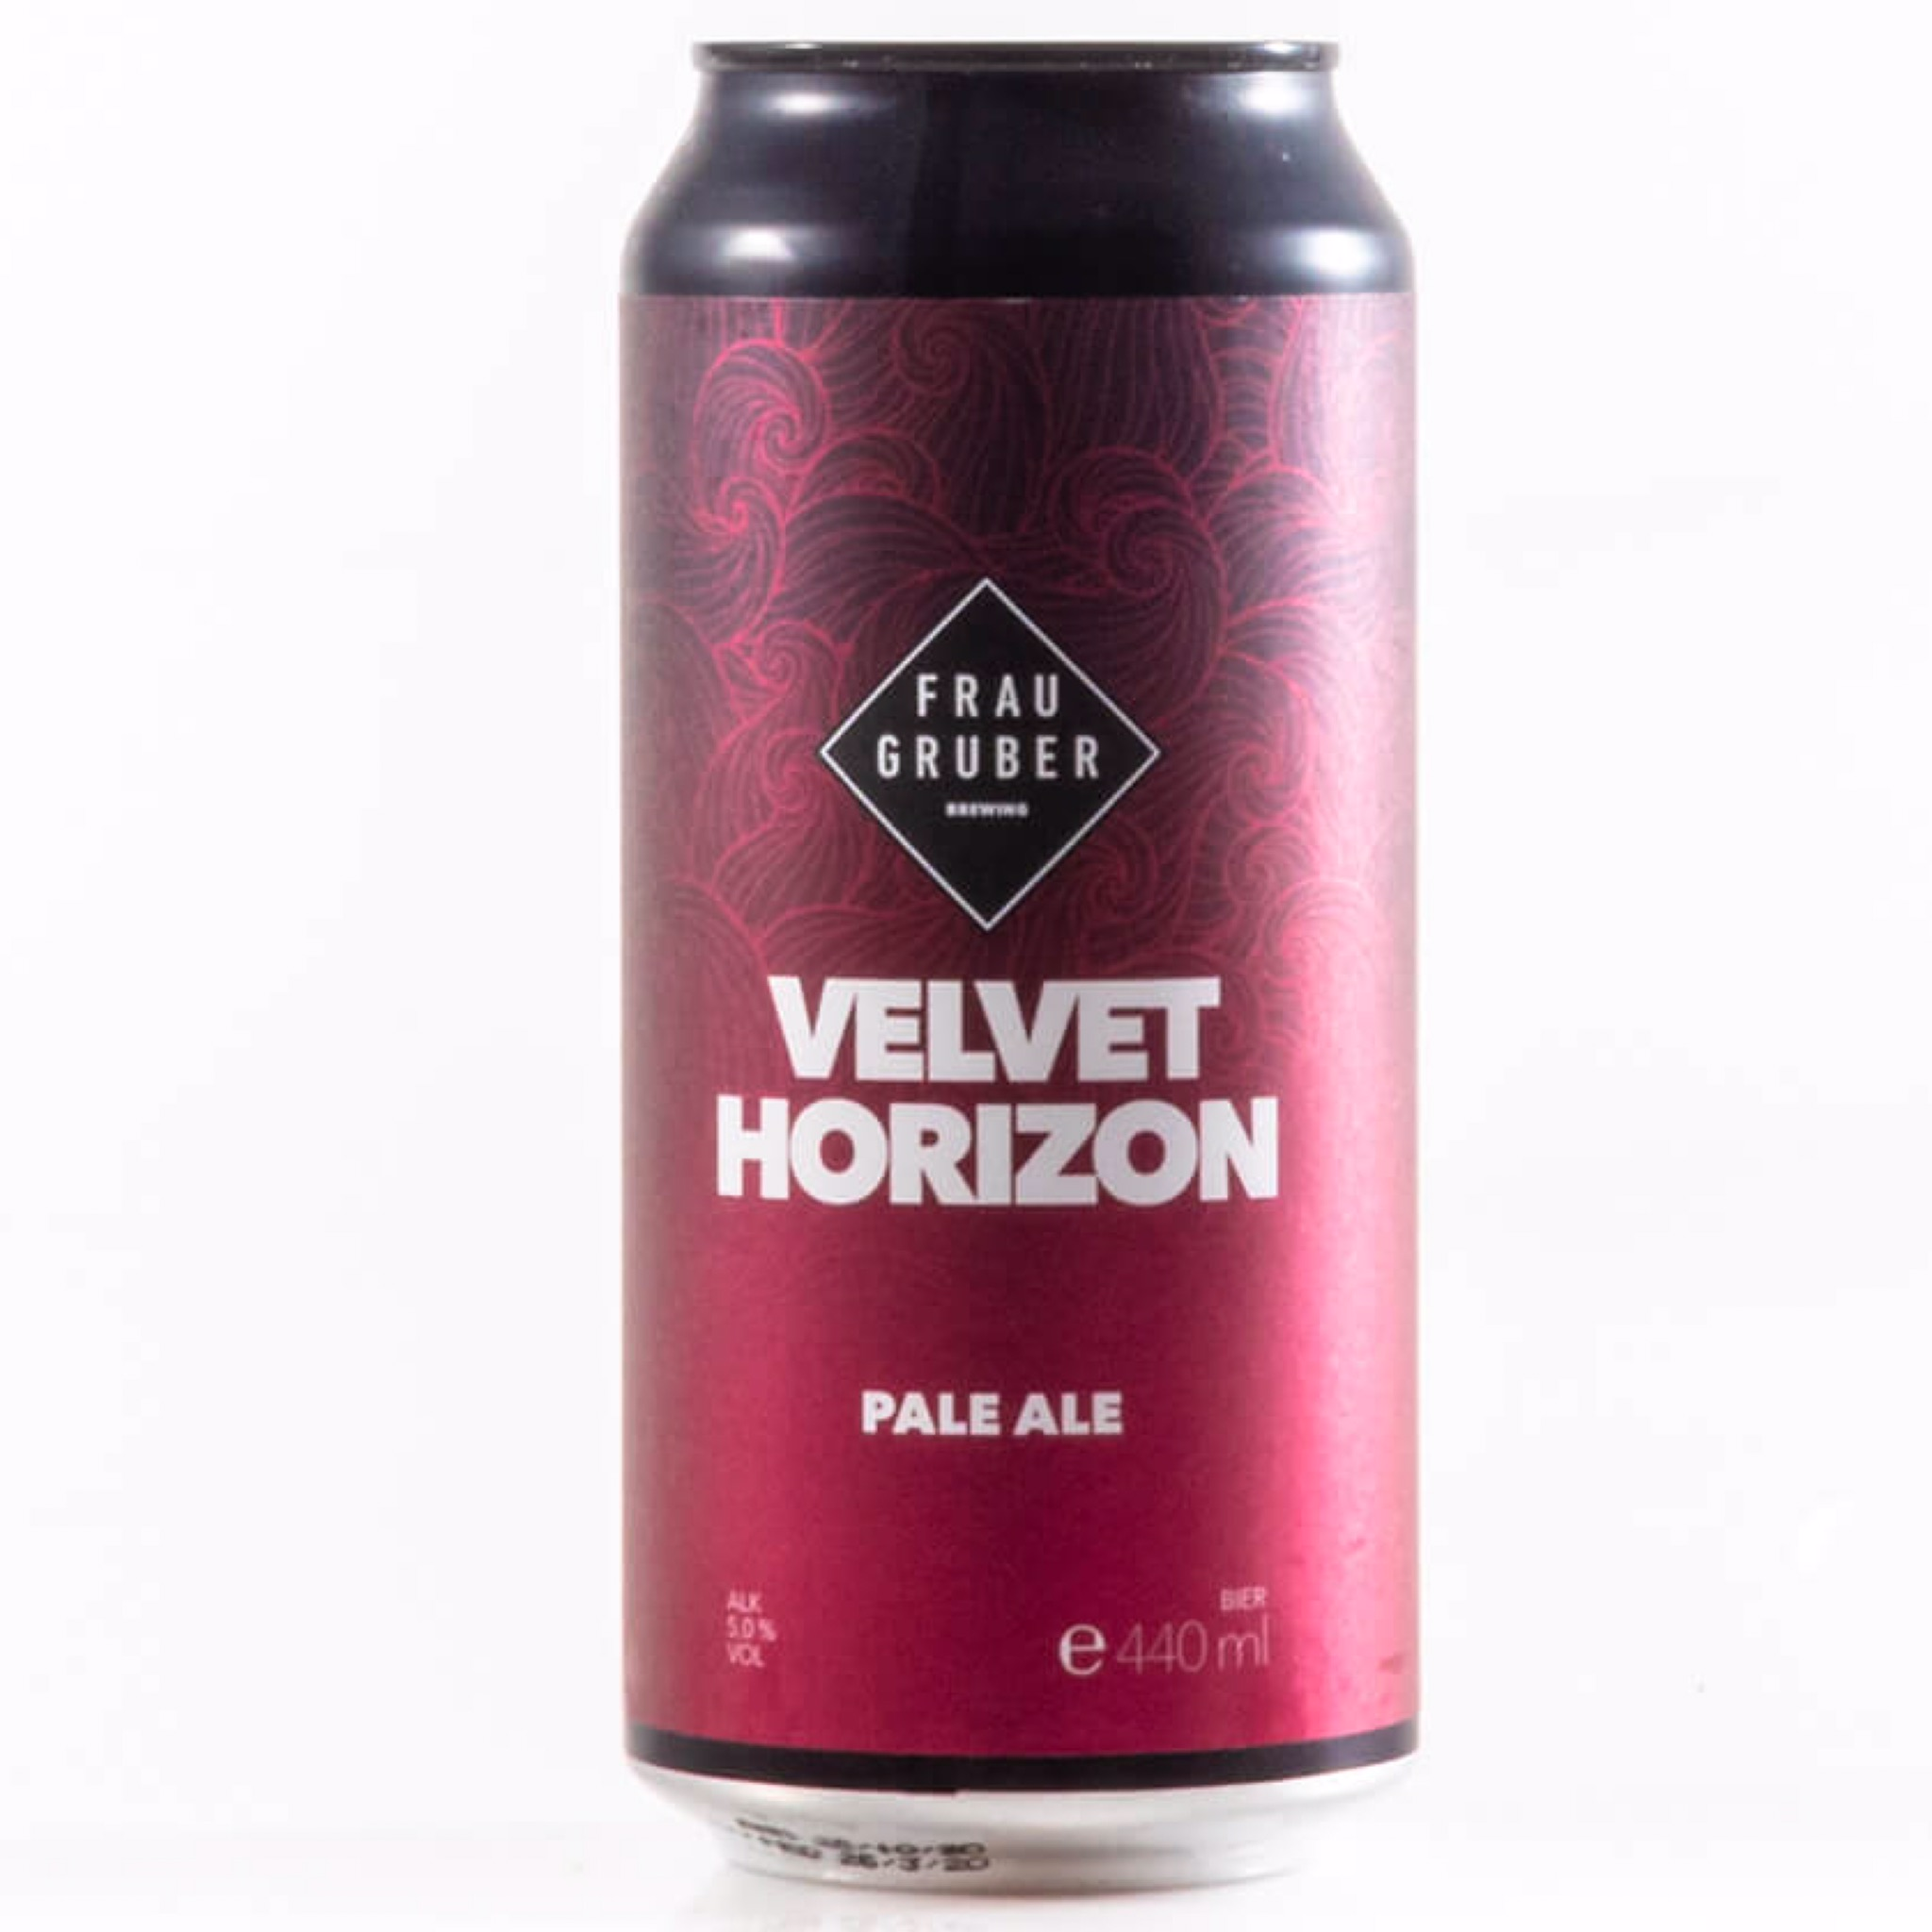 Velvet Horizon Pale Ale 5% 440ml Frau Gruber Brewing